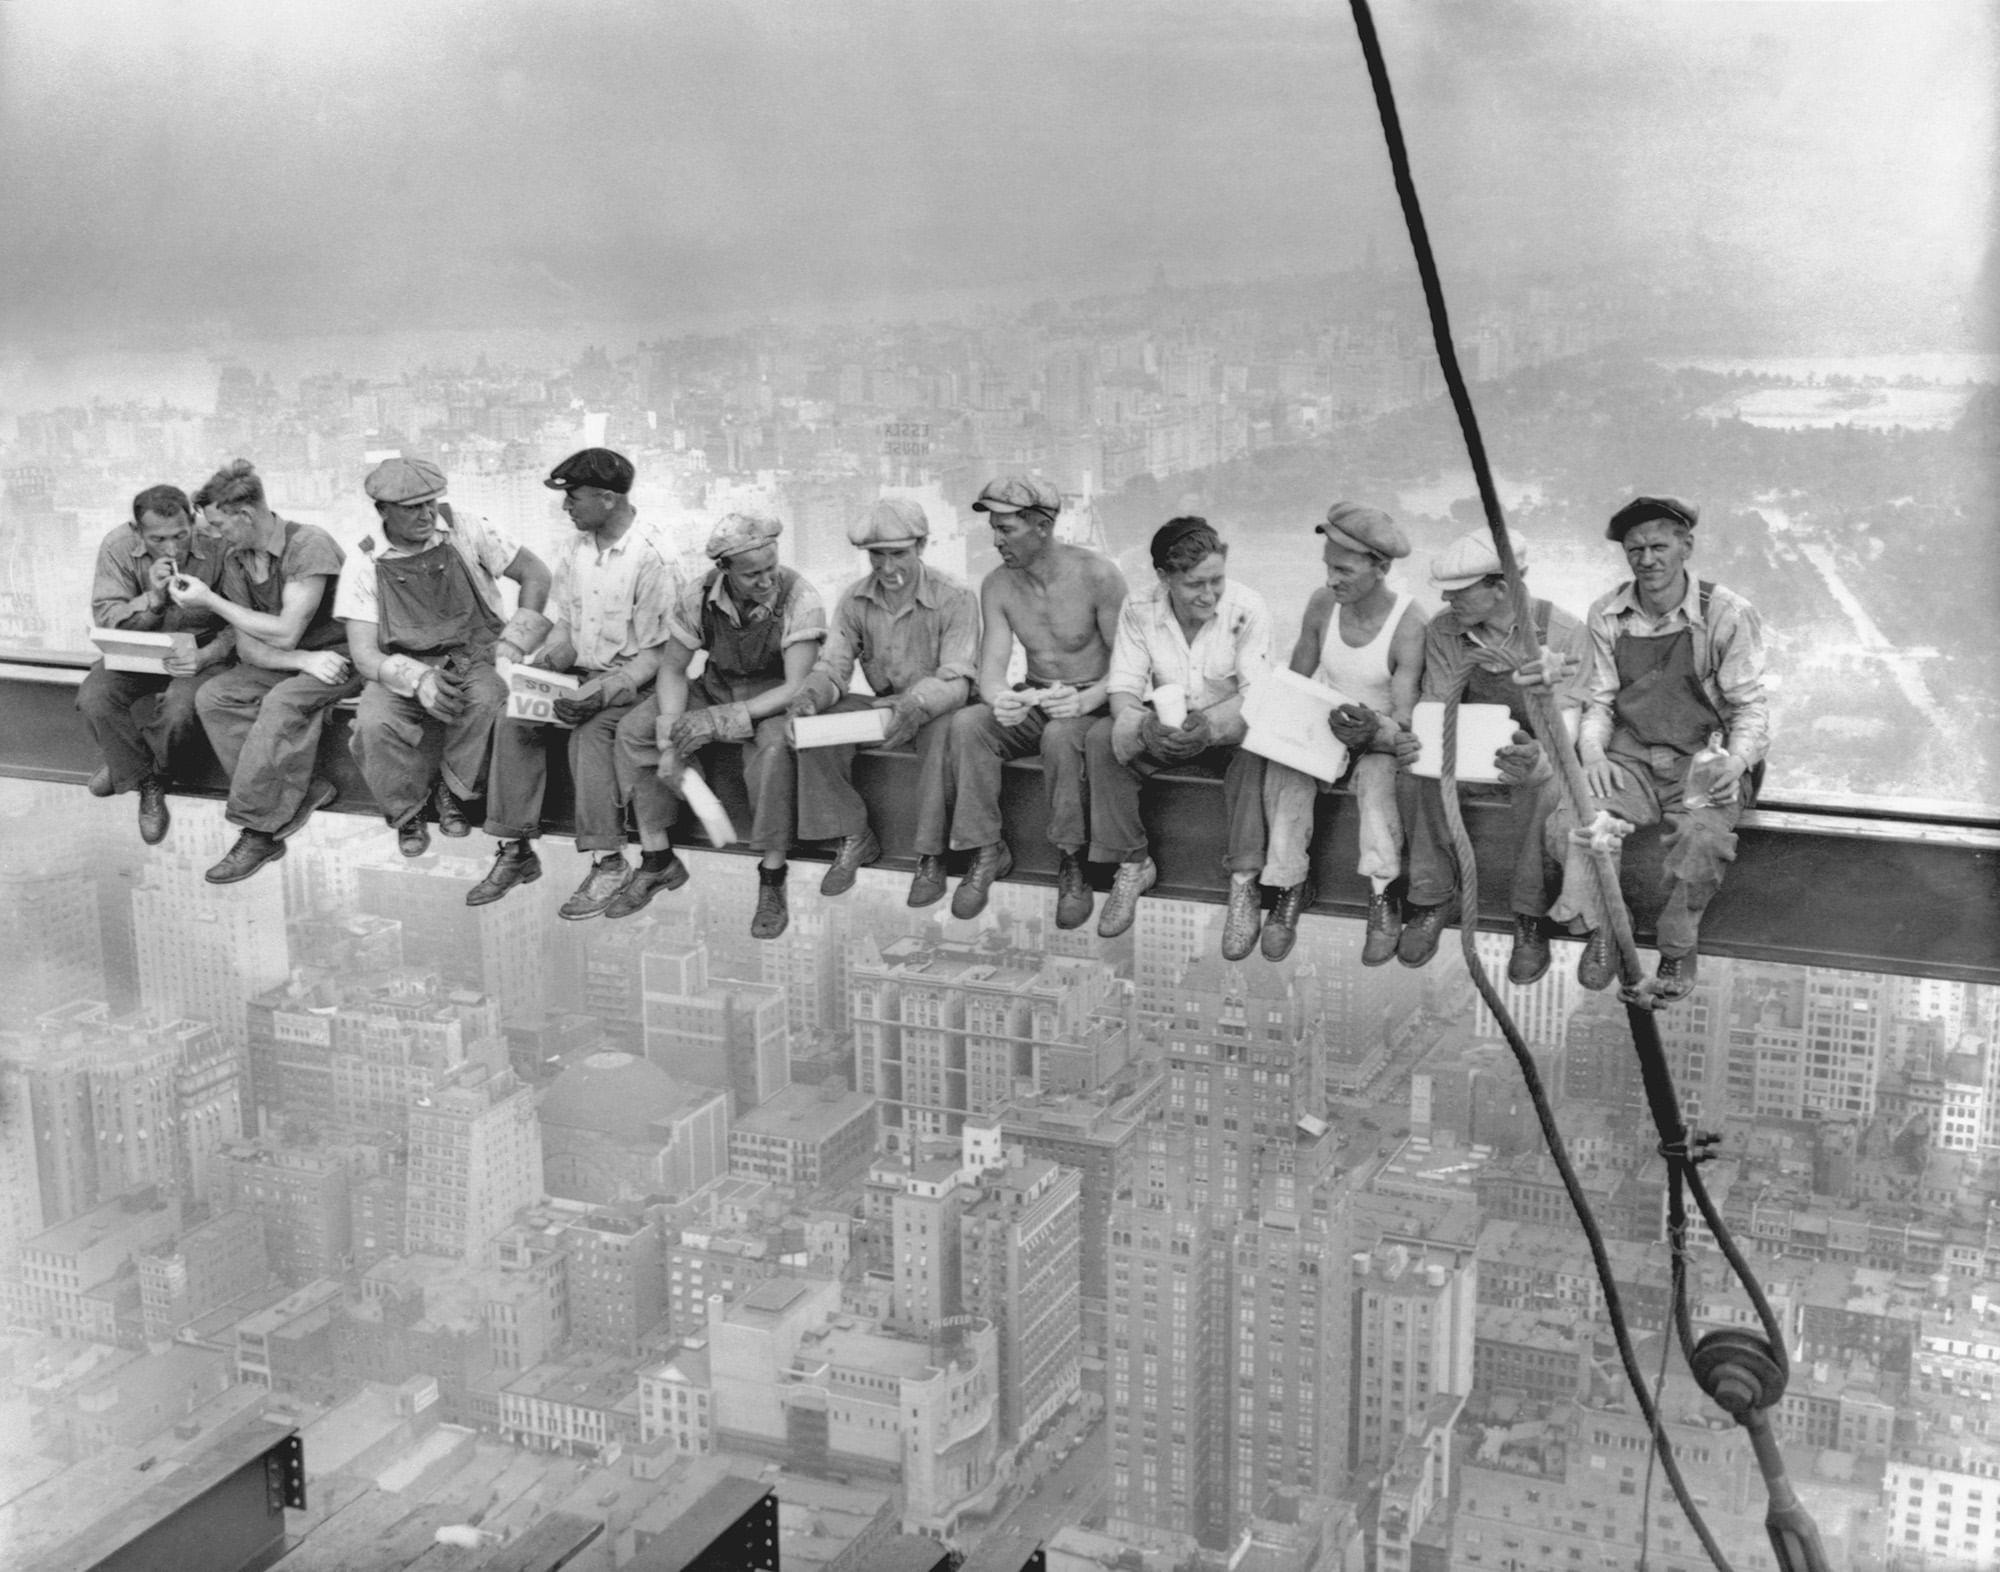 Builders in New York